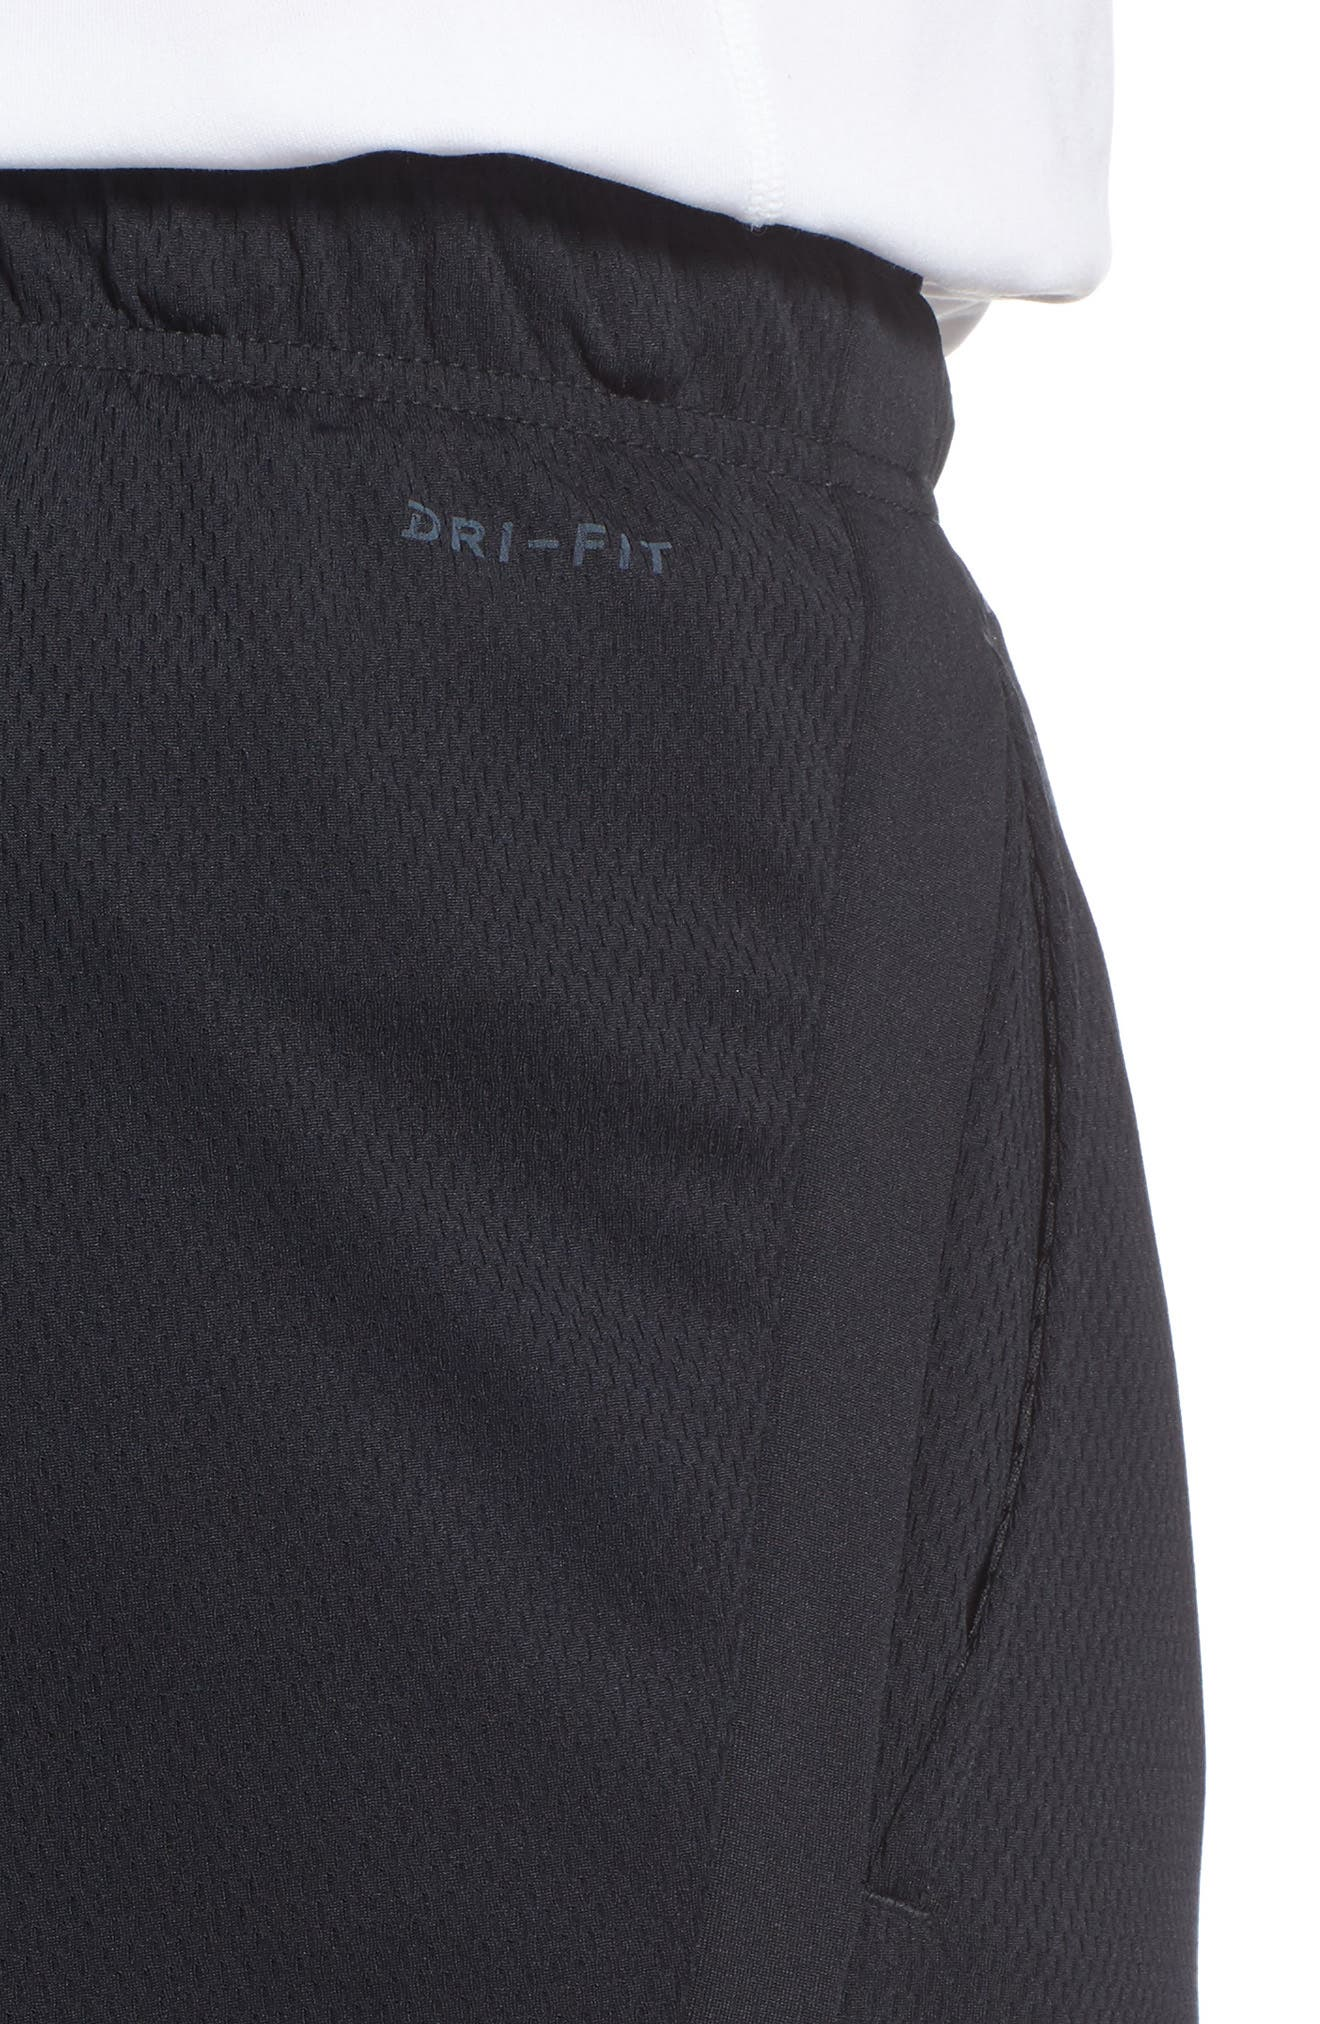 Training Dry 4.0 Shorts,                             Alternate thumbnail 19, color,